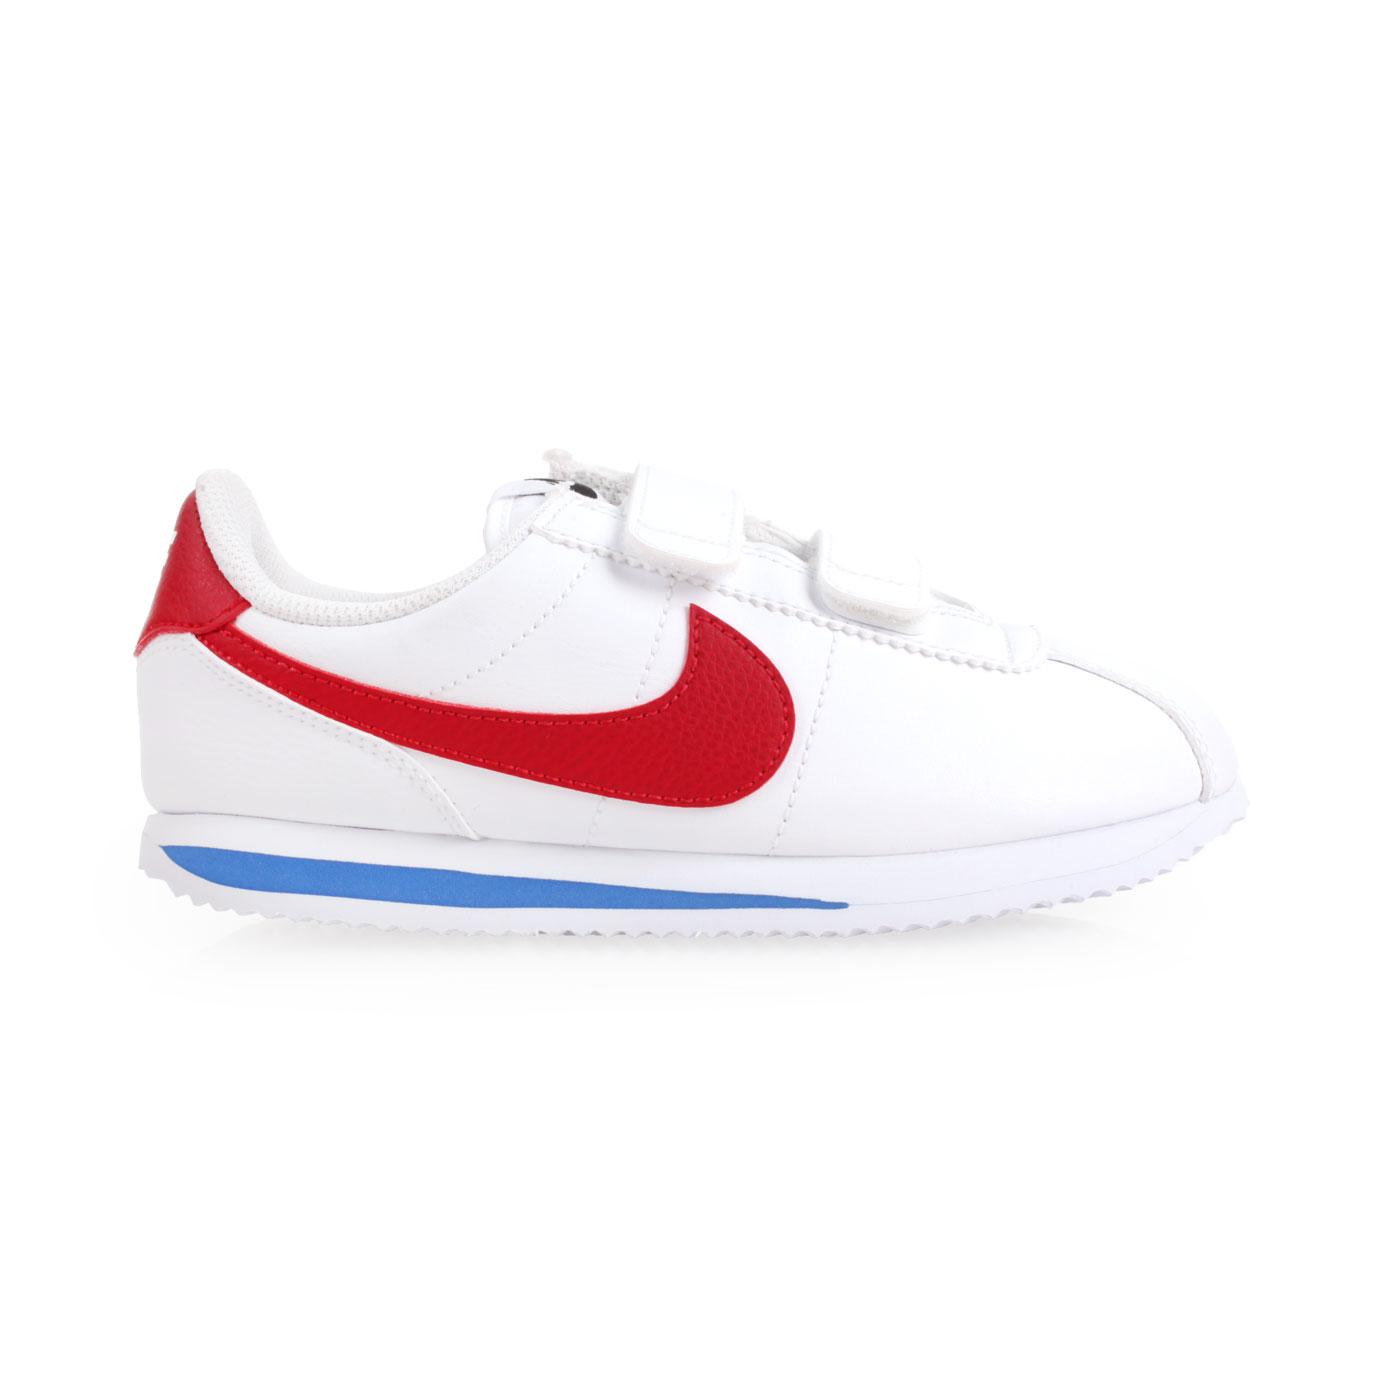 NIKE 兒童復古休閒鞋  @CORTEZ BASIC SL (PSV)@904767103 - 白紅藍